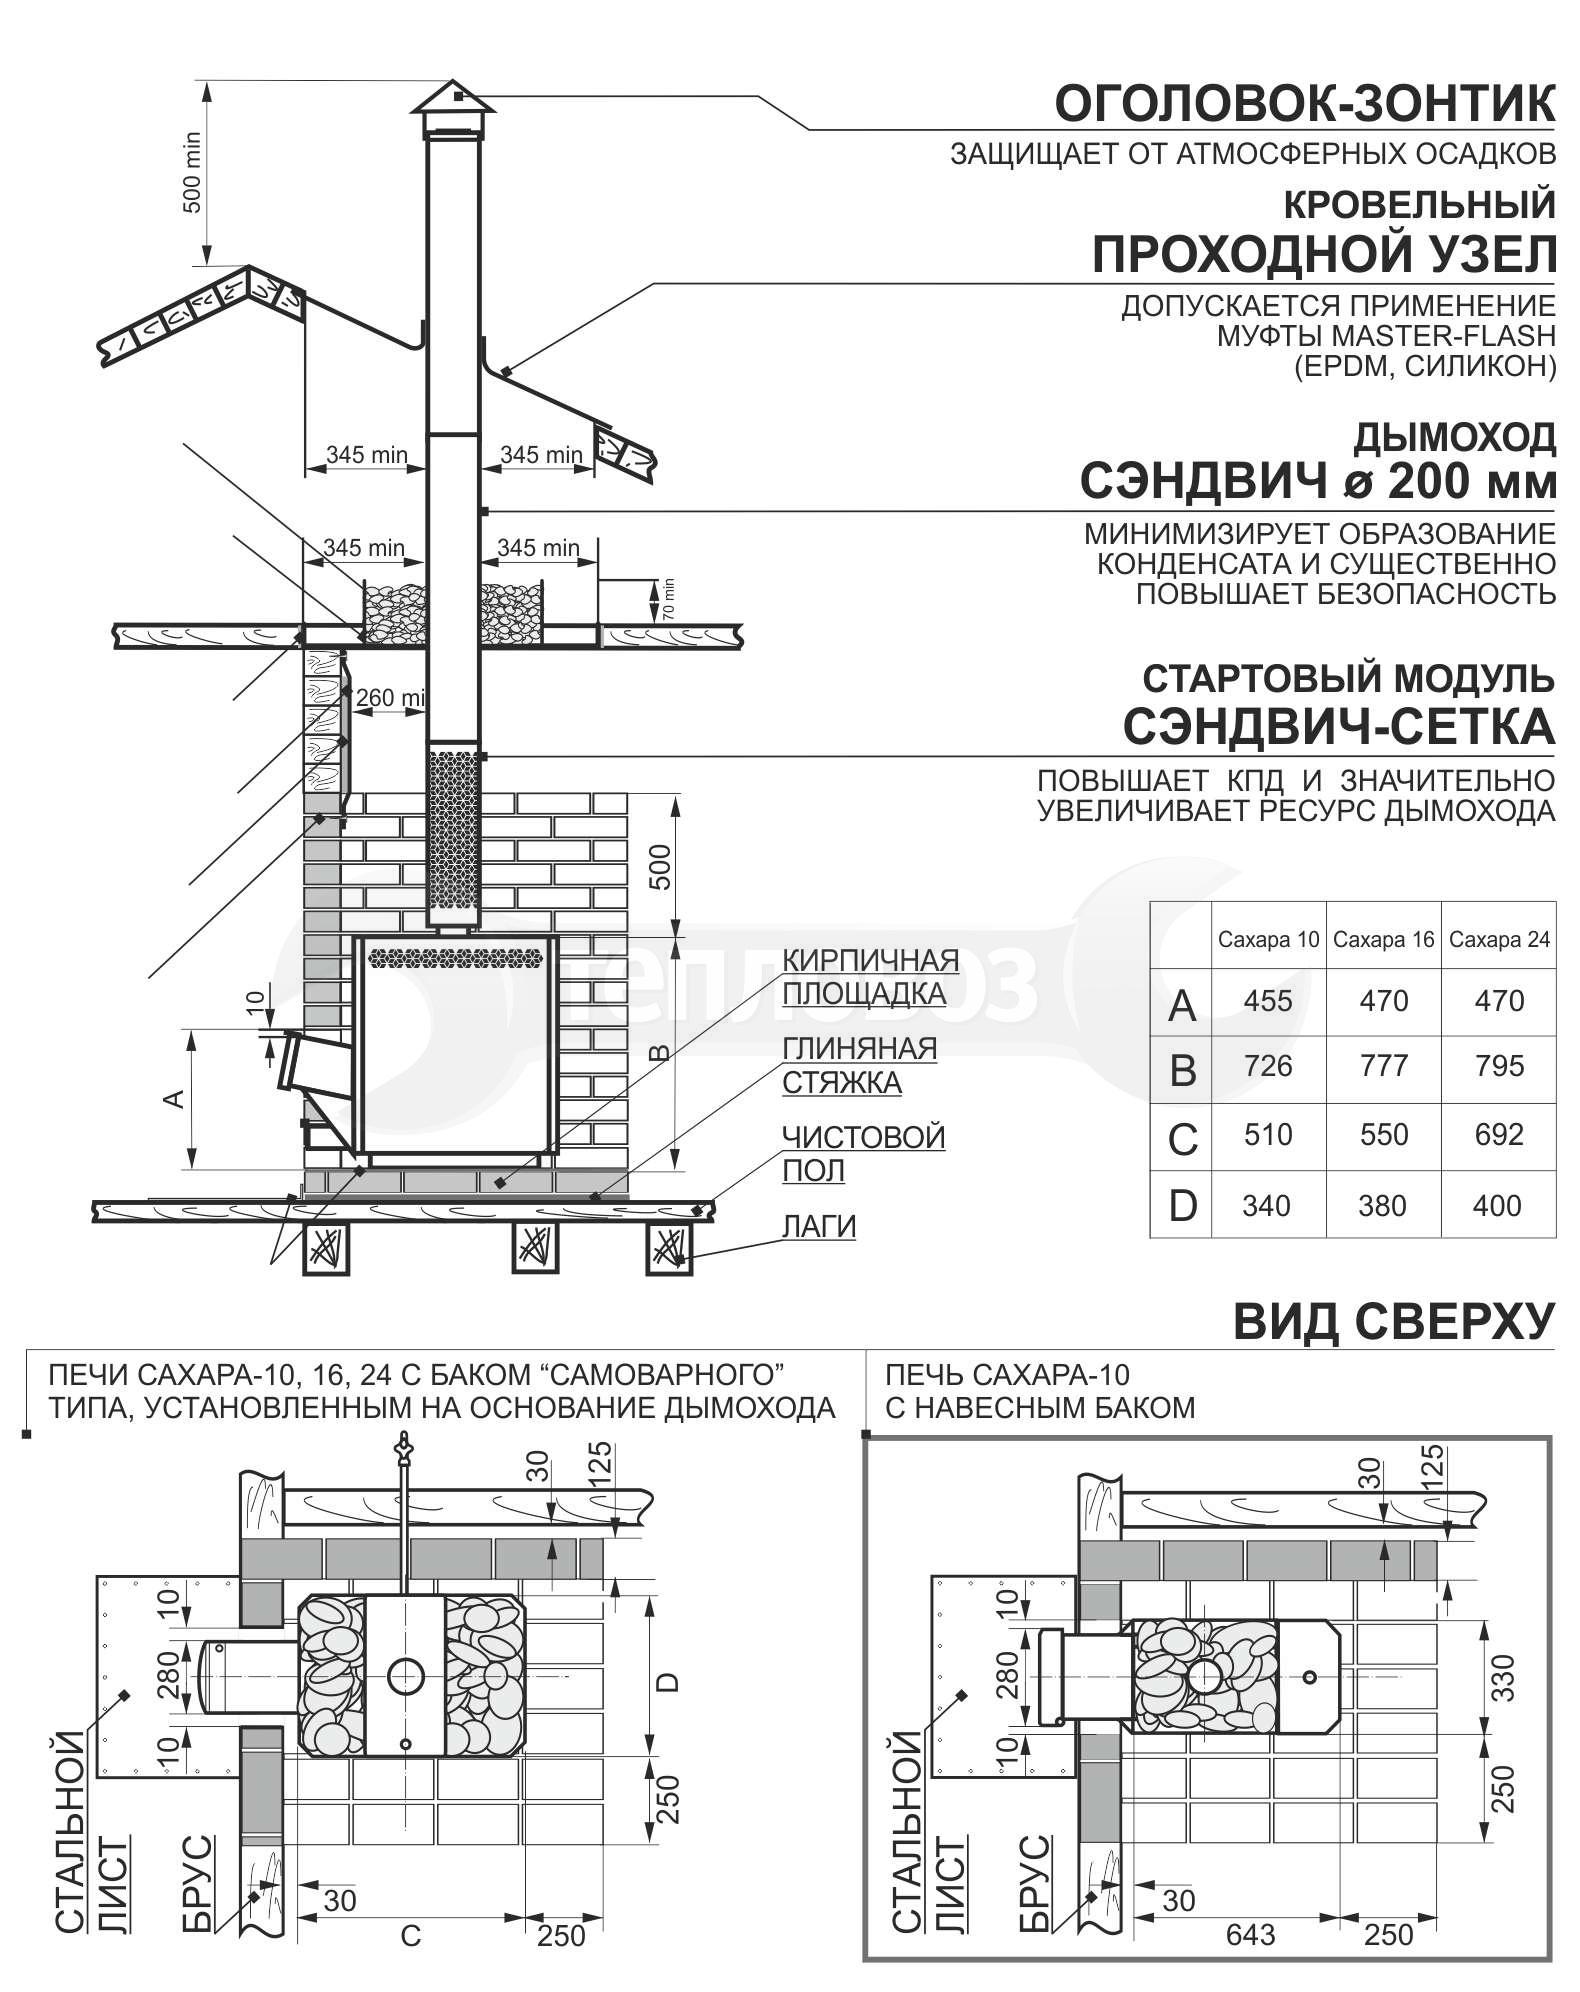 Теплодар Сахара-16 ЛК